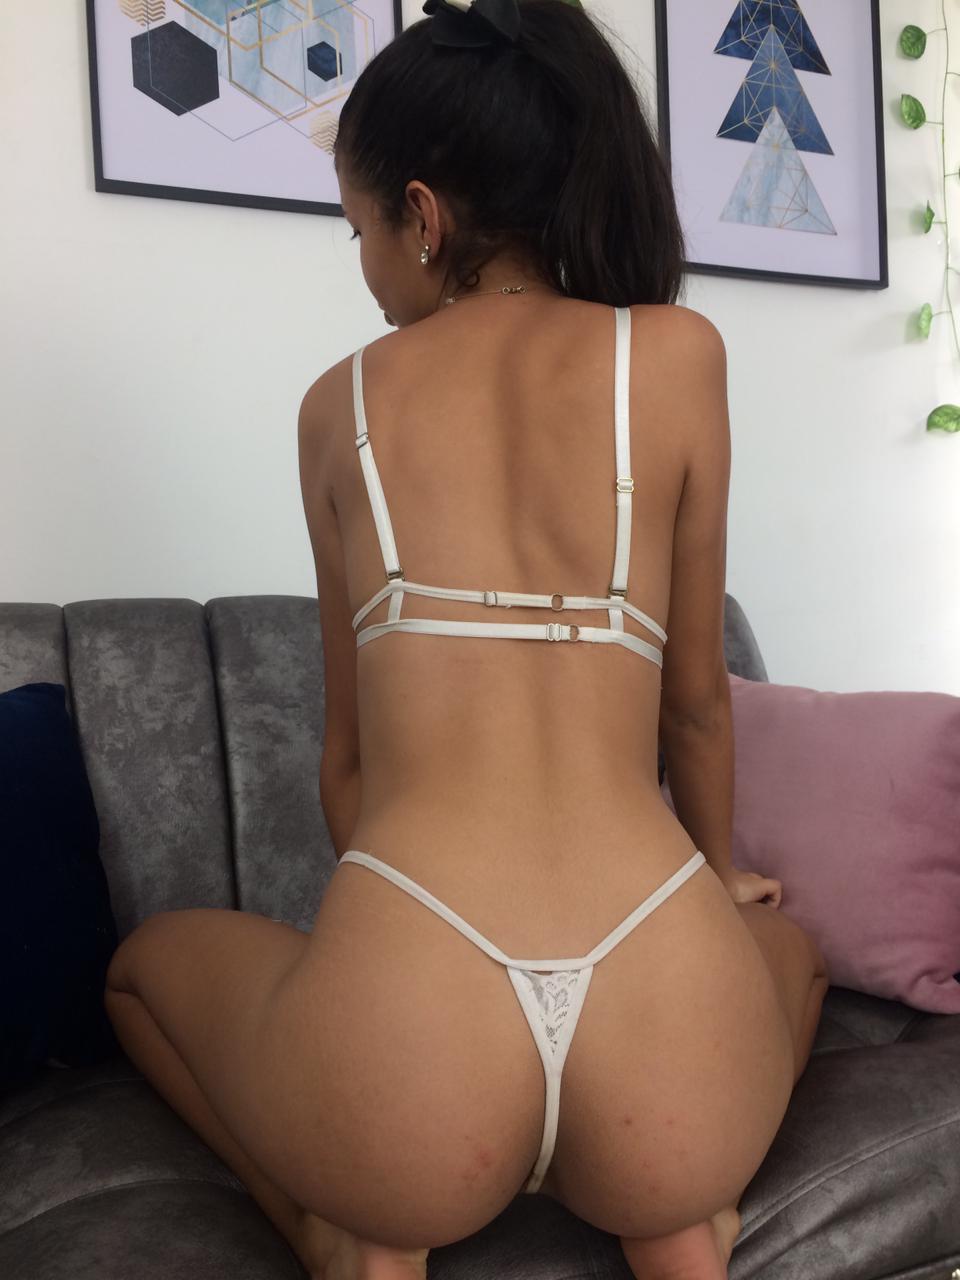 Sexy andreina69?s=mrpqz0r3qv5zb53gajaqluhq1a5gy4+3yzdsf0kniam=